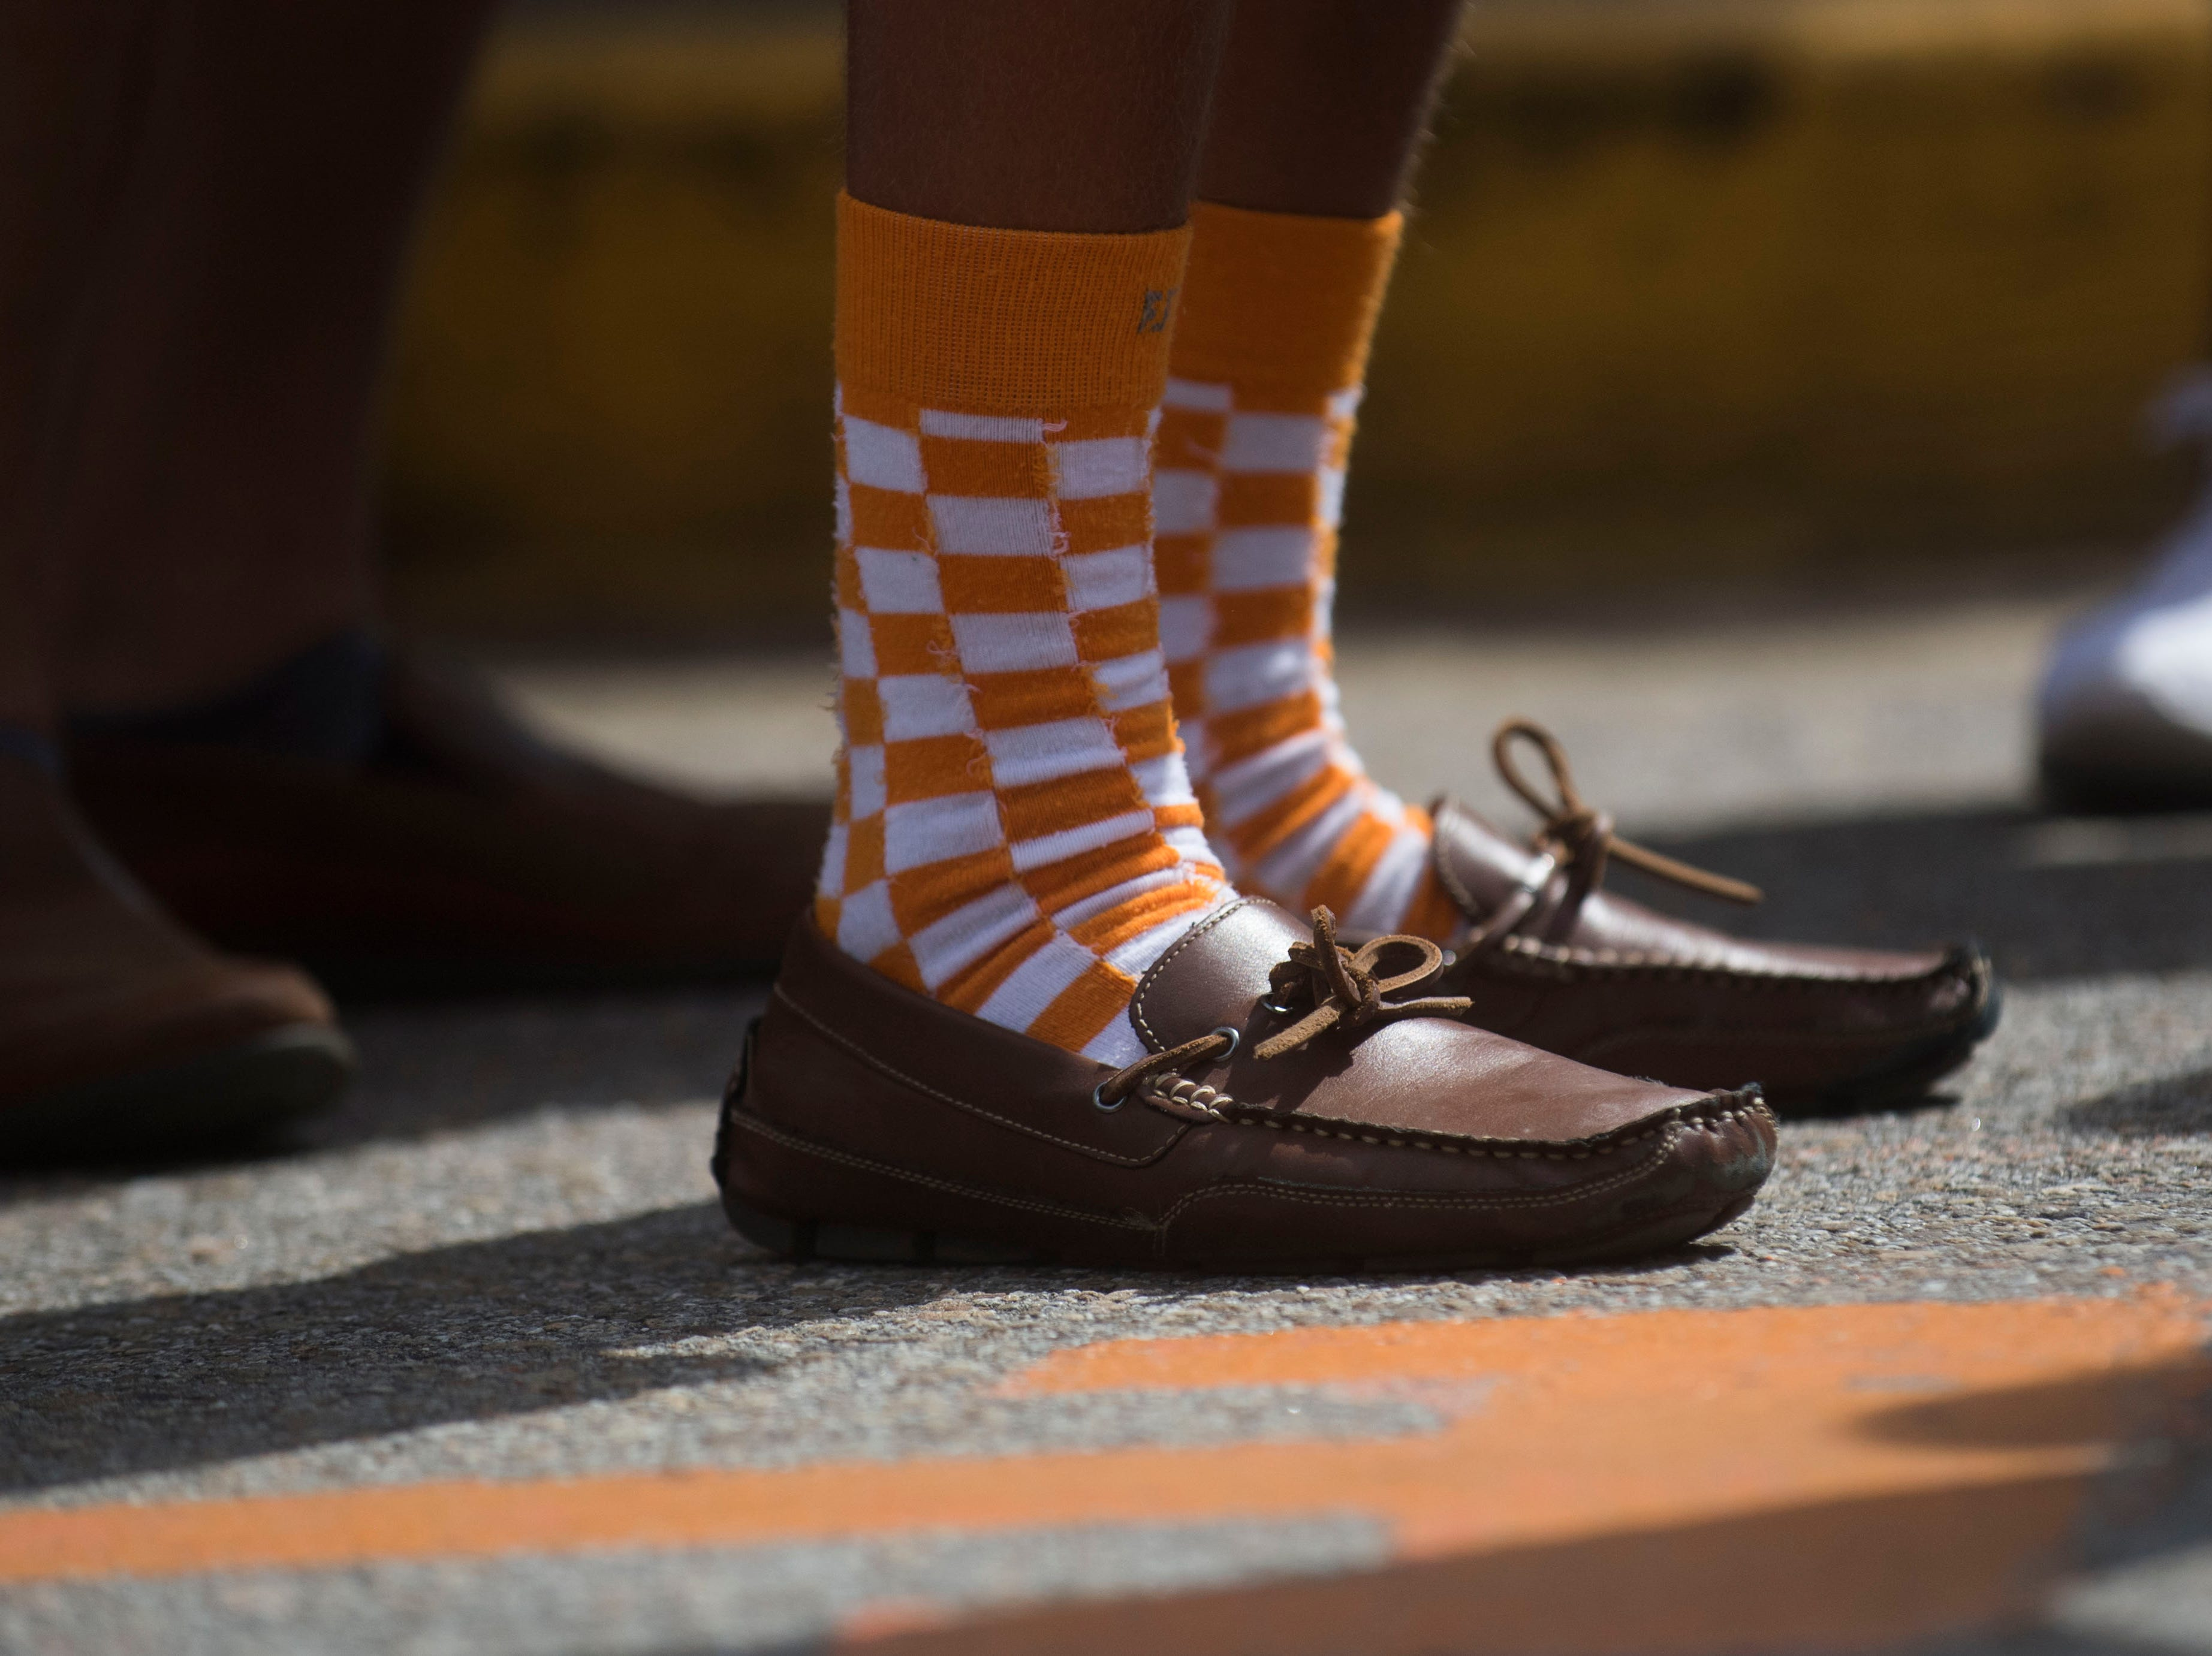 Alex Blackburn, of Mobile, Alabama sports checkered socks before a Tennessee Vols football game against ETSU outside Neyland Stadium Saturday, Sept. 8, 2018.